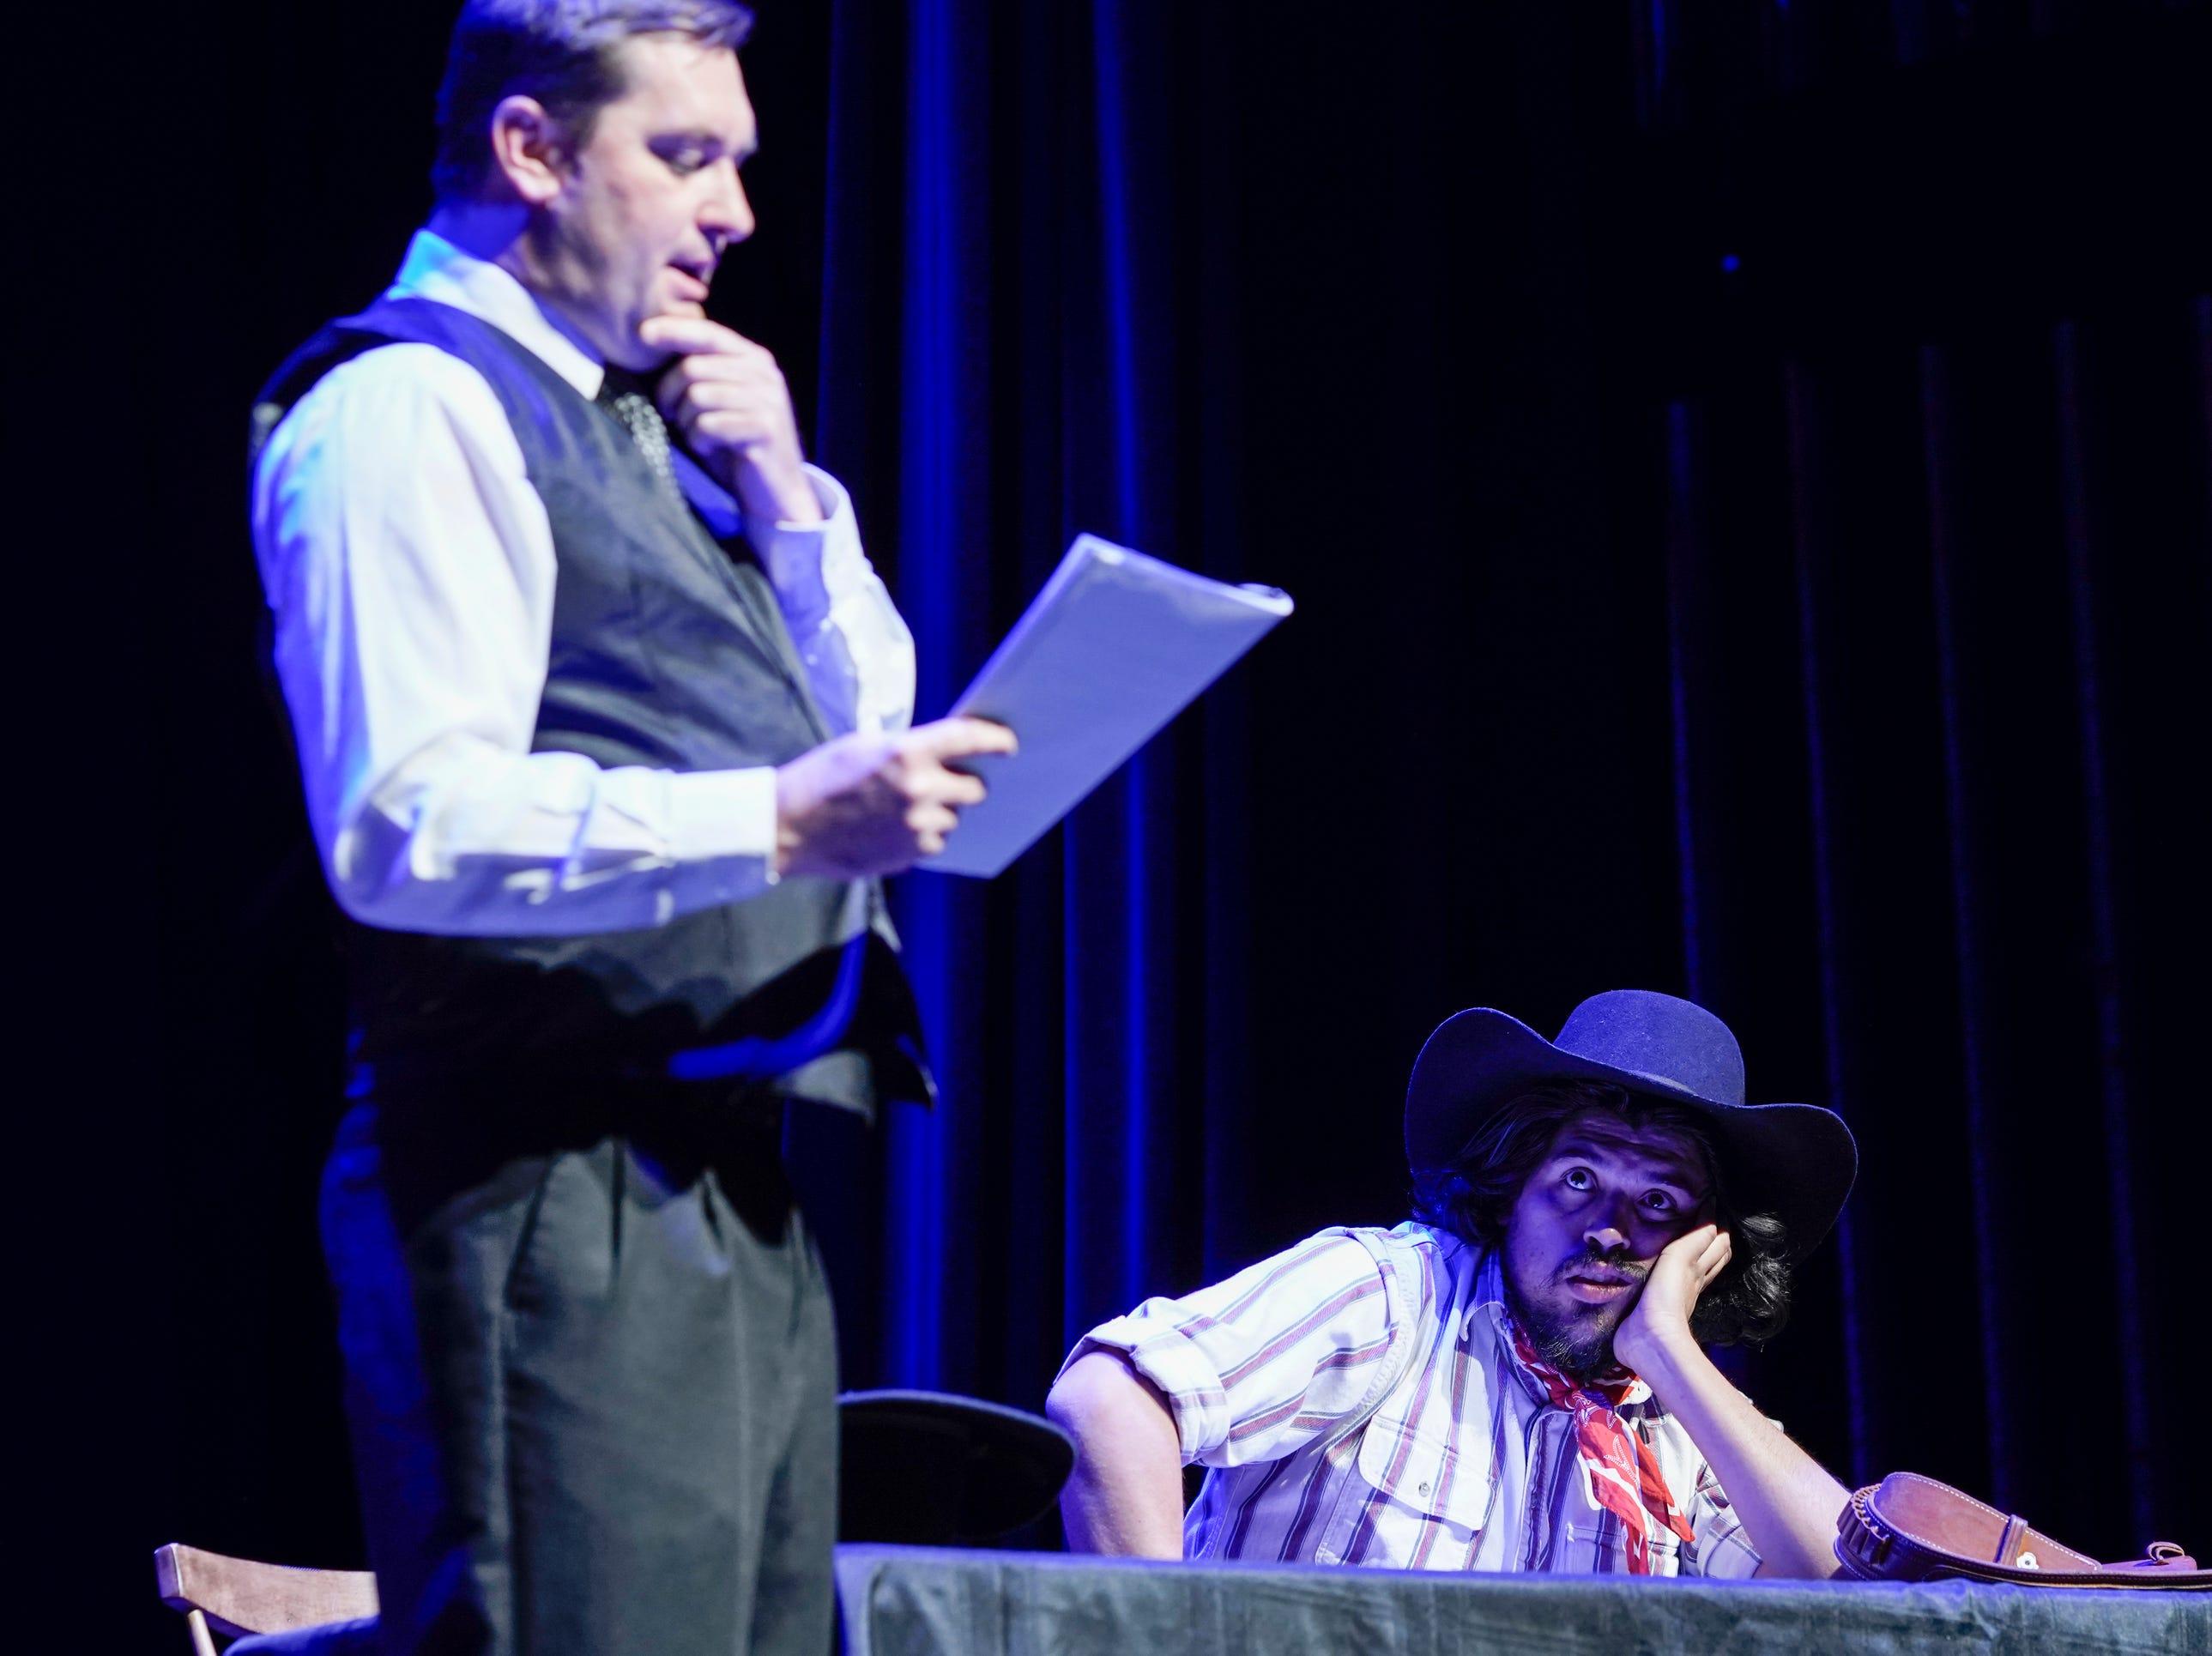 Jason Wyatt, left, portraying Jesse Wayne Brazel's counsel, Herbert Holt, and Mozart Pierson, as Brazel, reenact Brazel's 1909 murder trial at the Rio Grande Theatre on Saturday, Feb. 2, 2019.